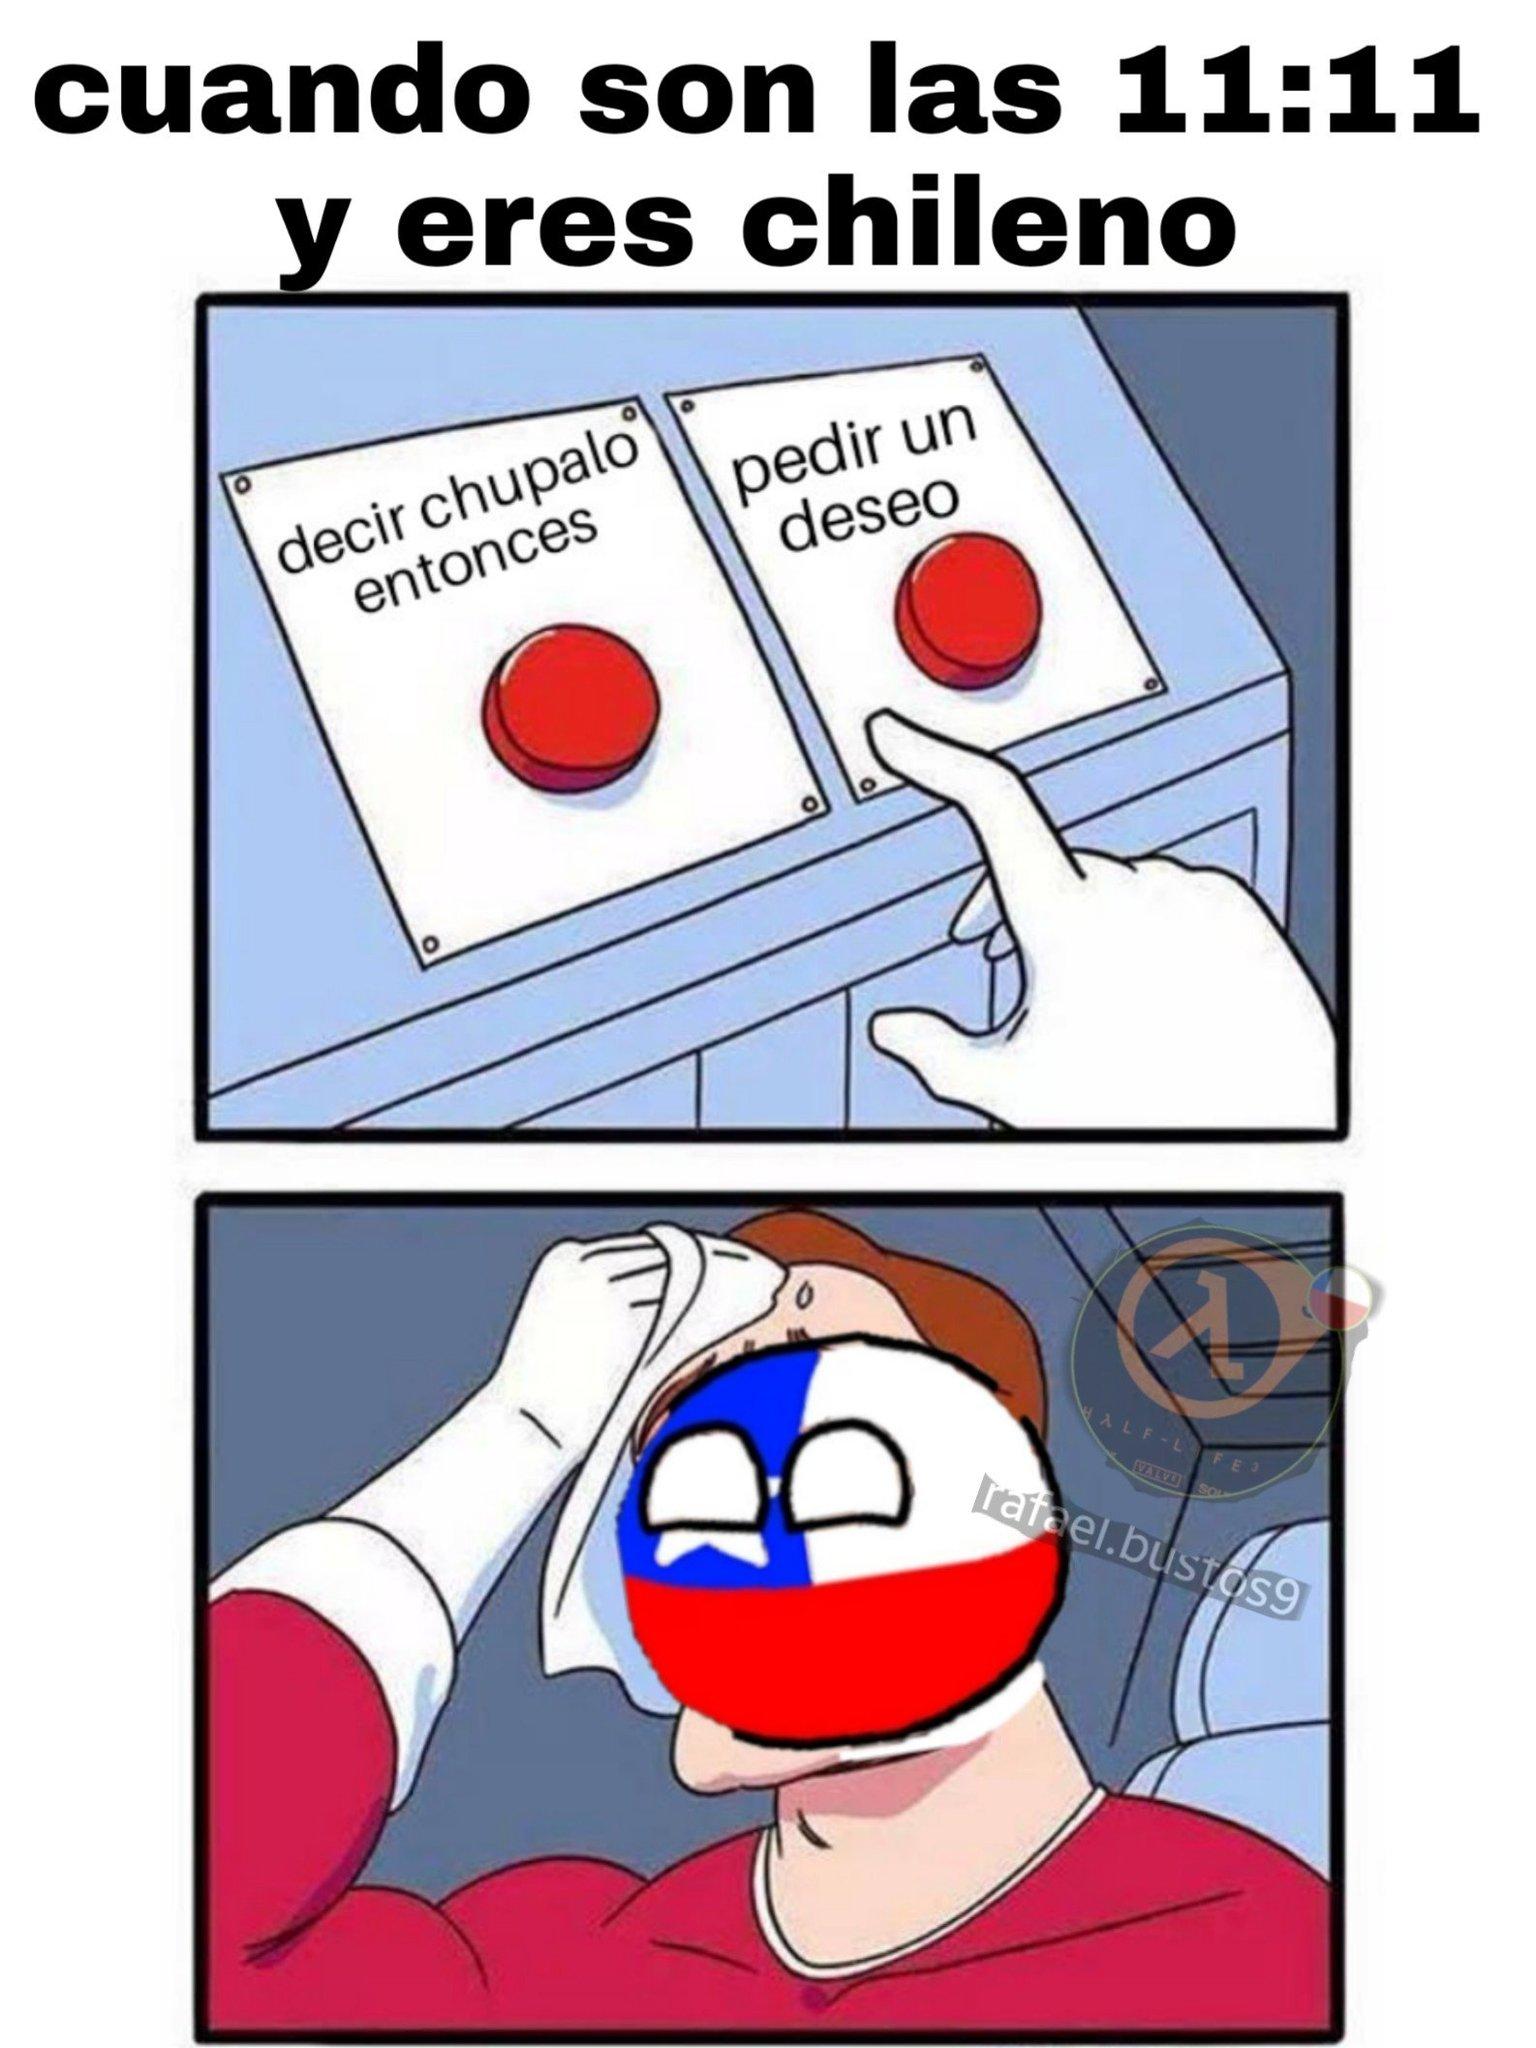 Típico chileno - meme